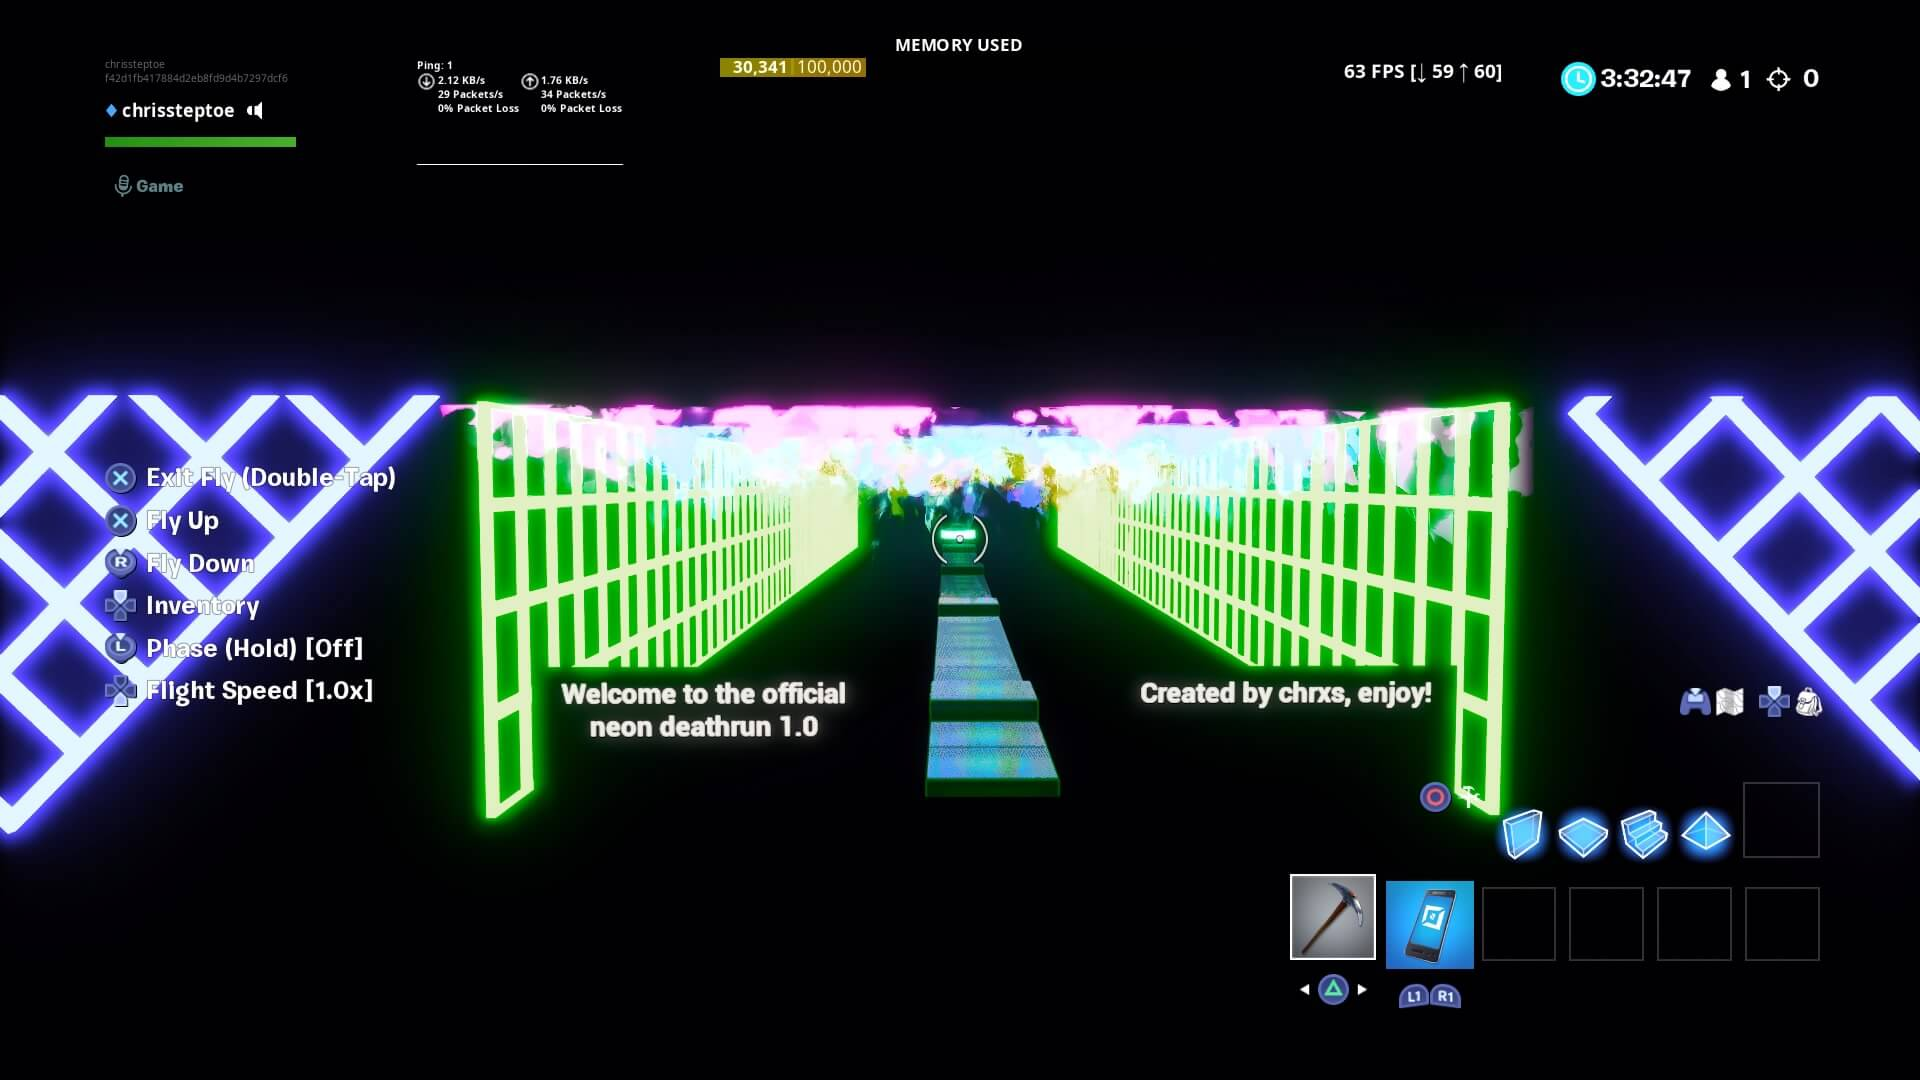 Fortnite Creative Adventure Map Codes - Fortnite Creative